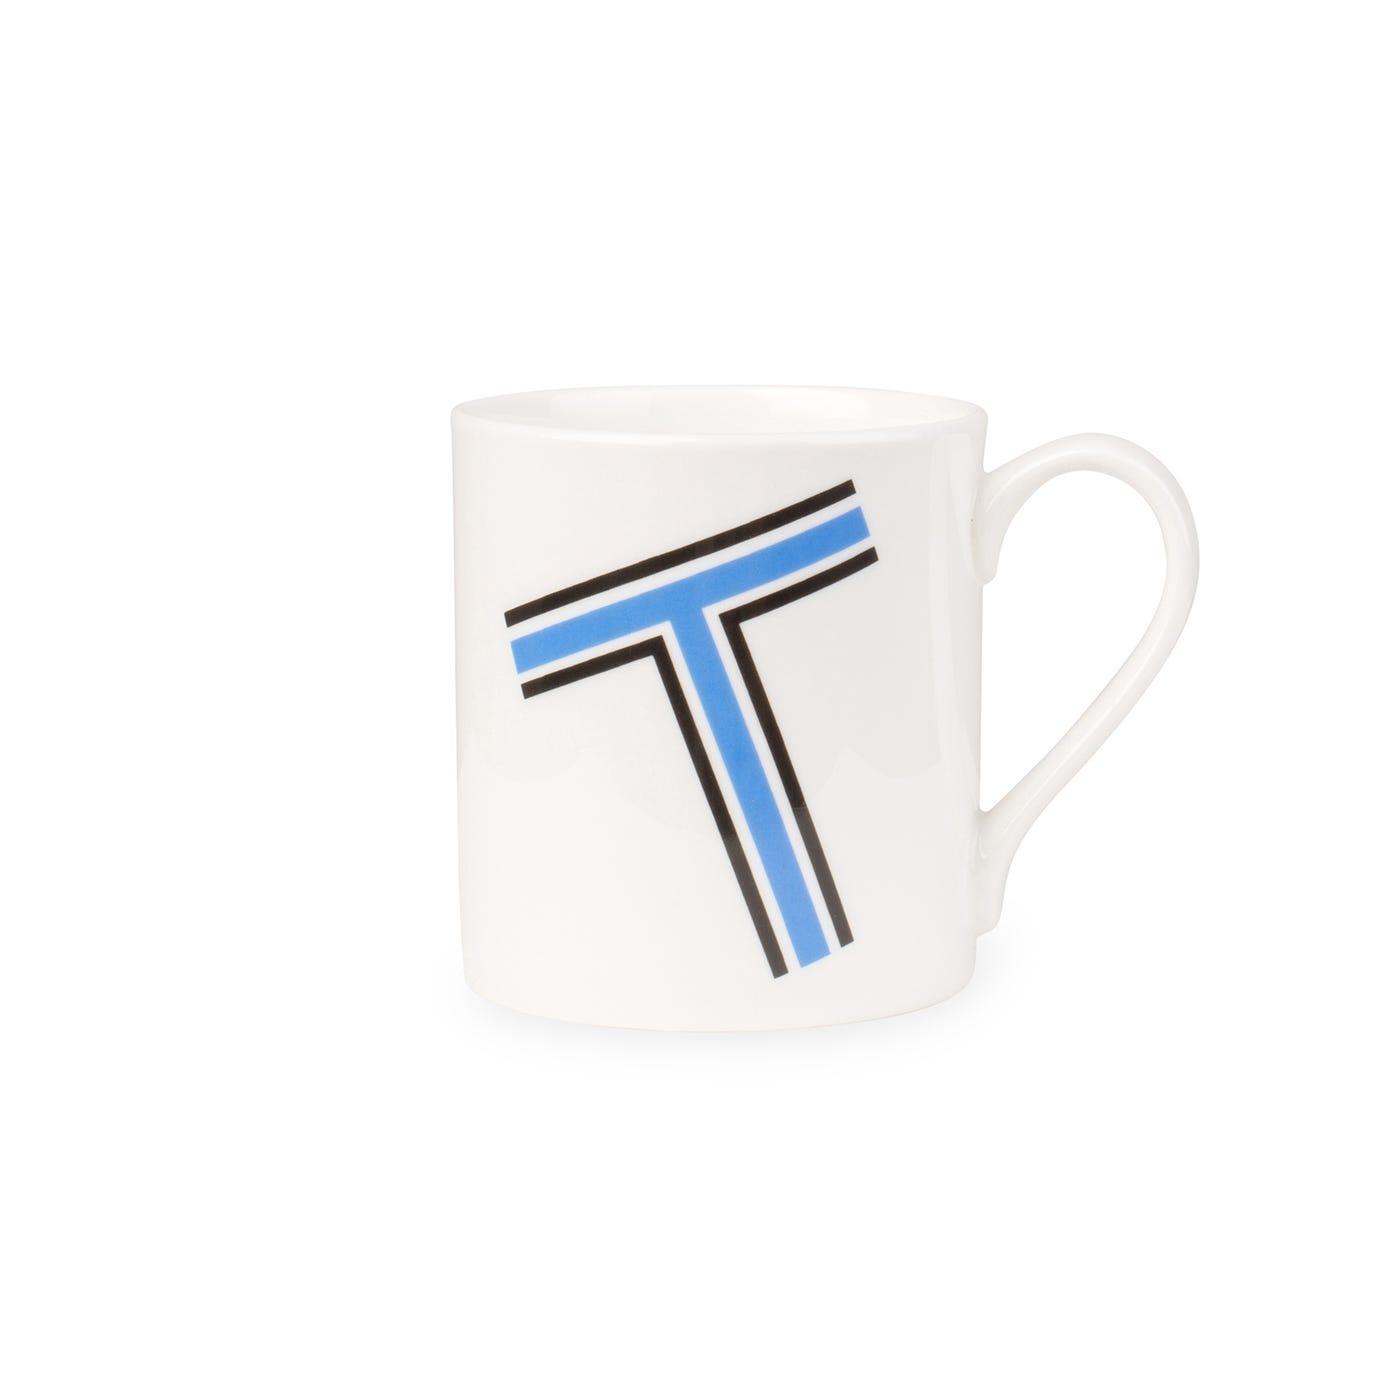 Heal's Heal's Heritage Alphabet Mug T